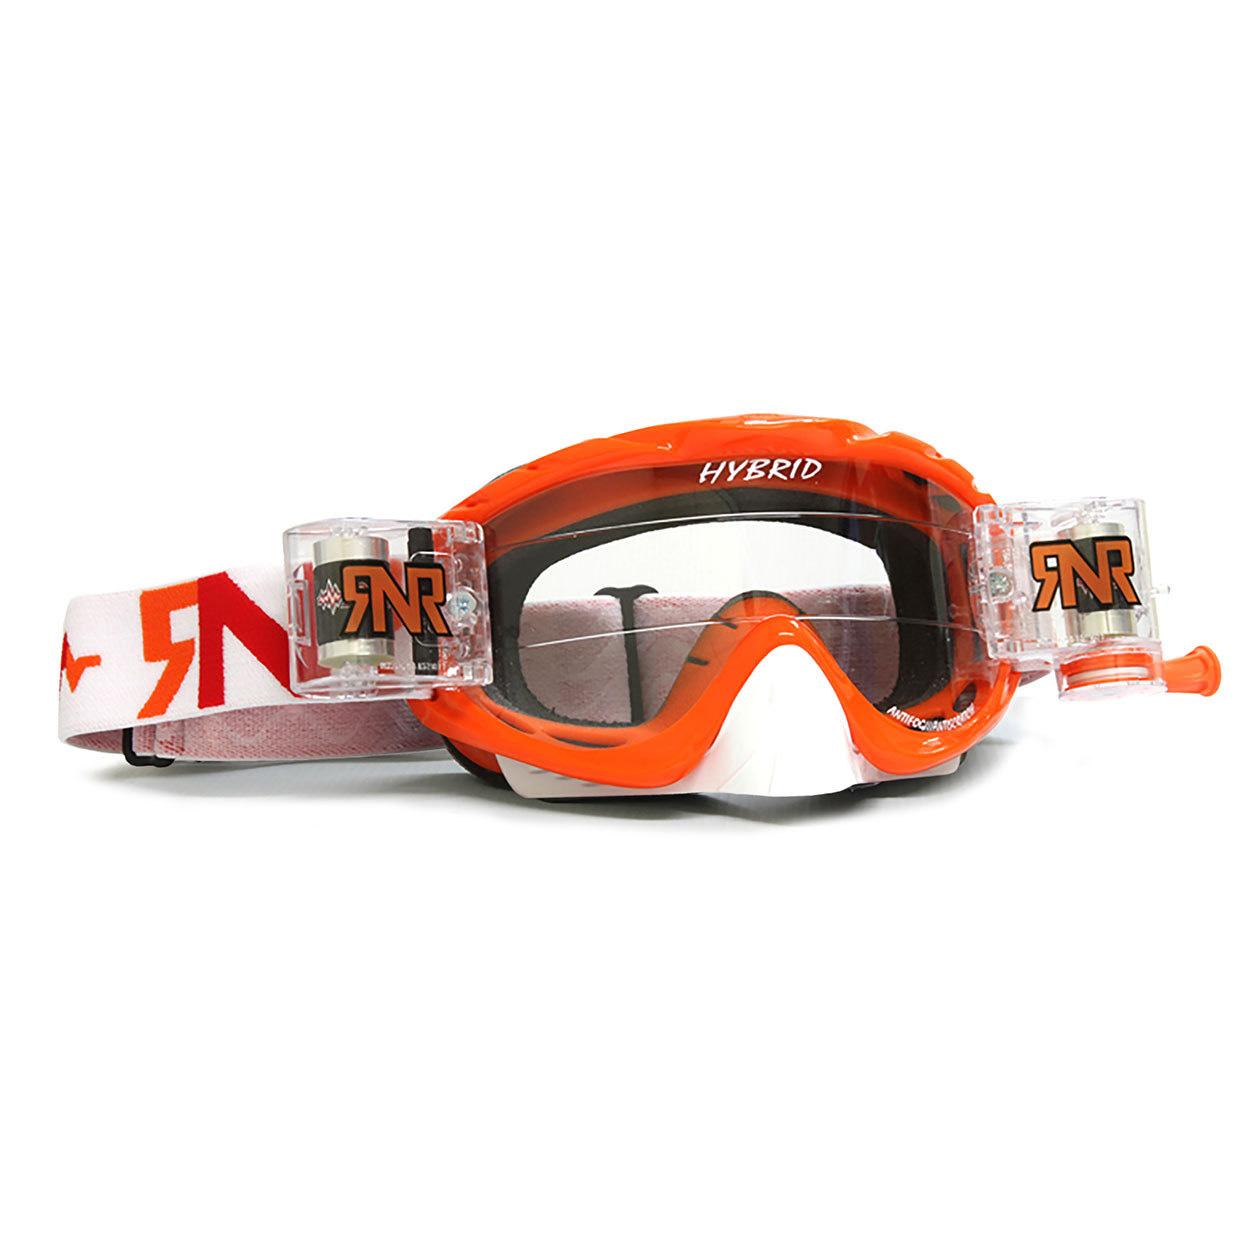 RNR Crossbril Racerpack Hybrid - Seville Oranje